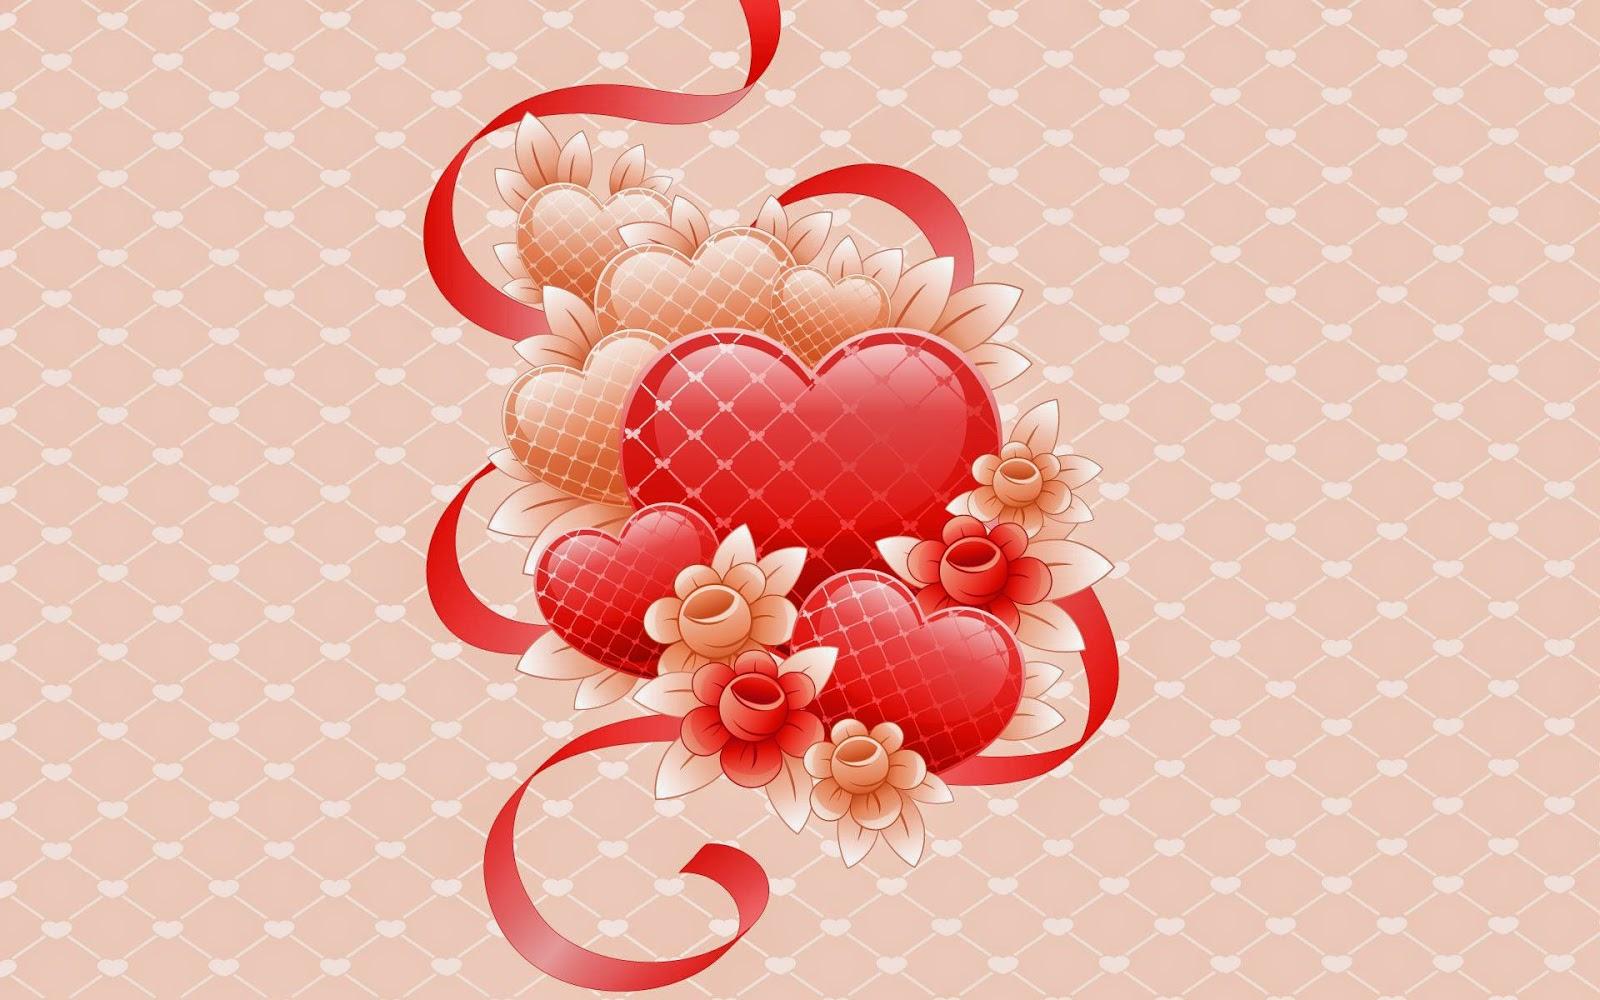 Imagenes de San Valentin, parte 2